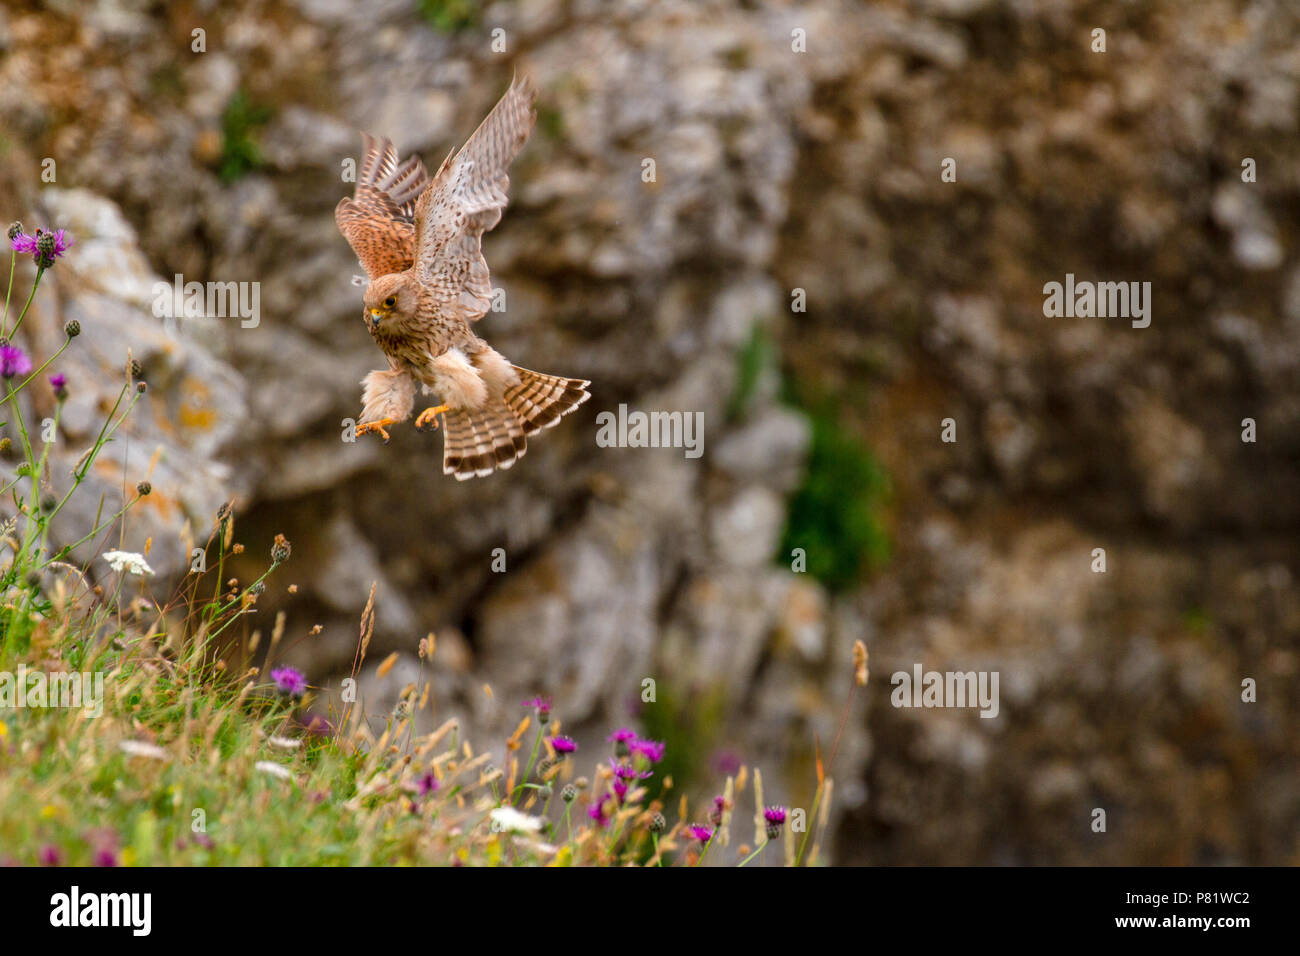 Eurasian Kestrel (Falco tinnunculus) on Pembrokeshire Cliff, Wales, UK - Stock Image